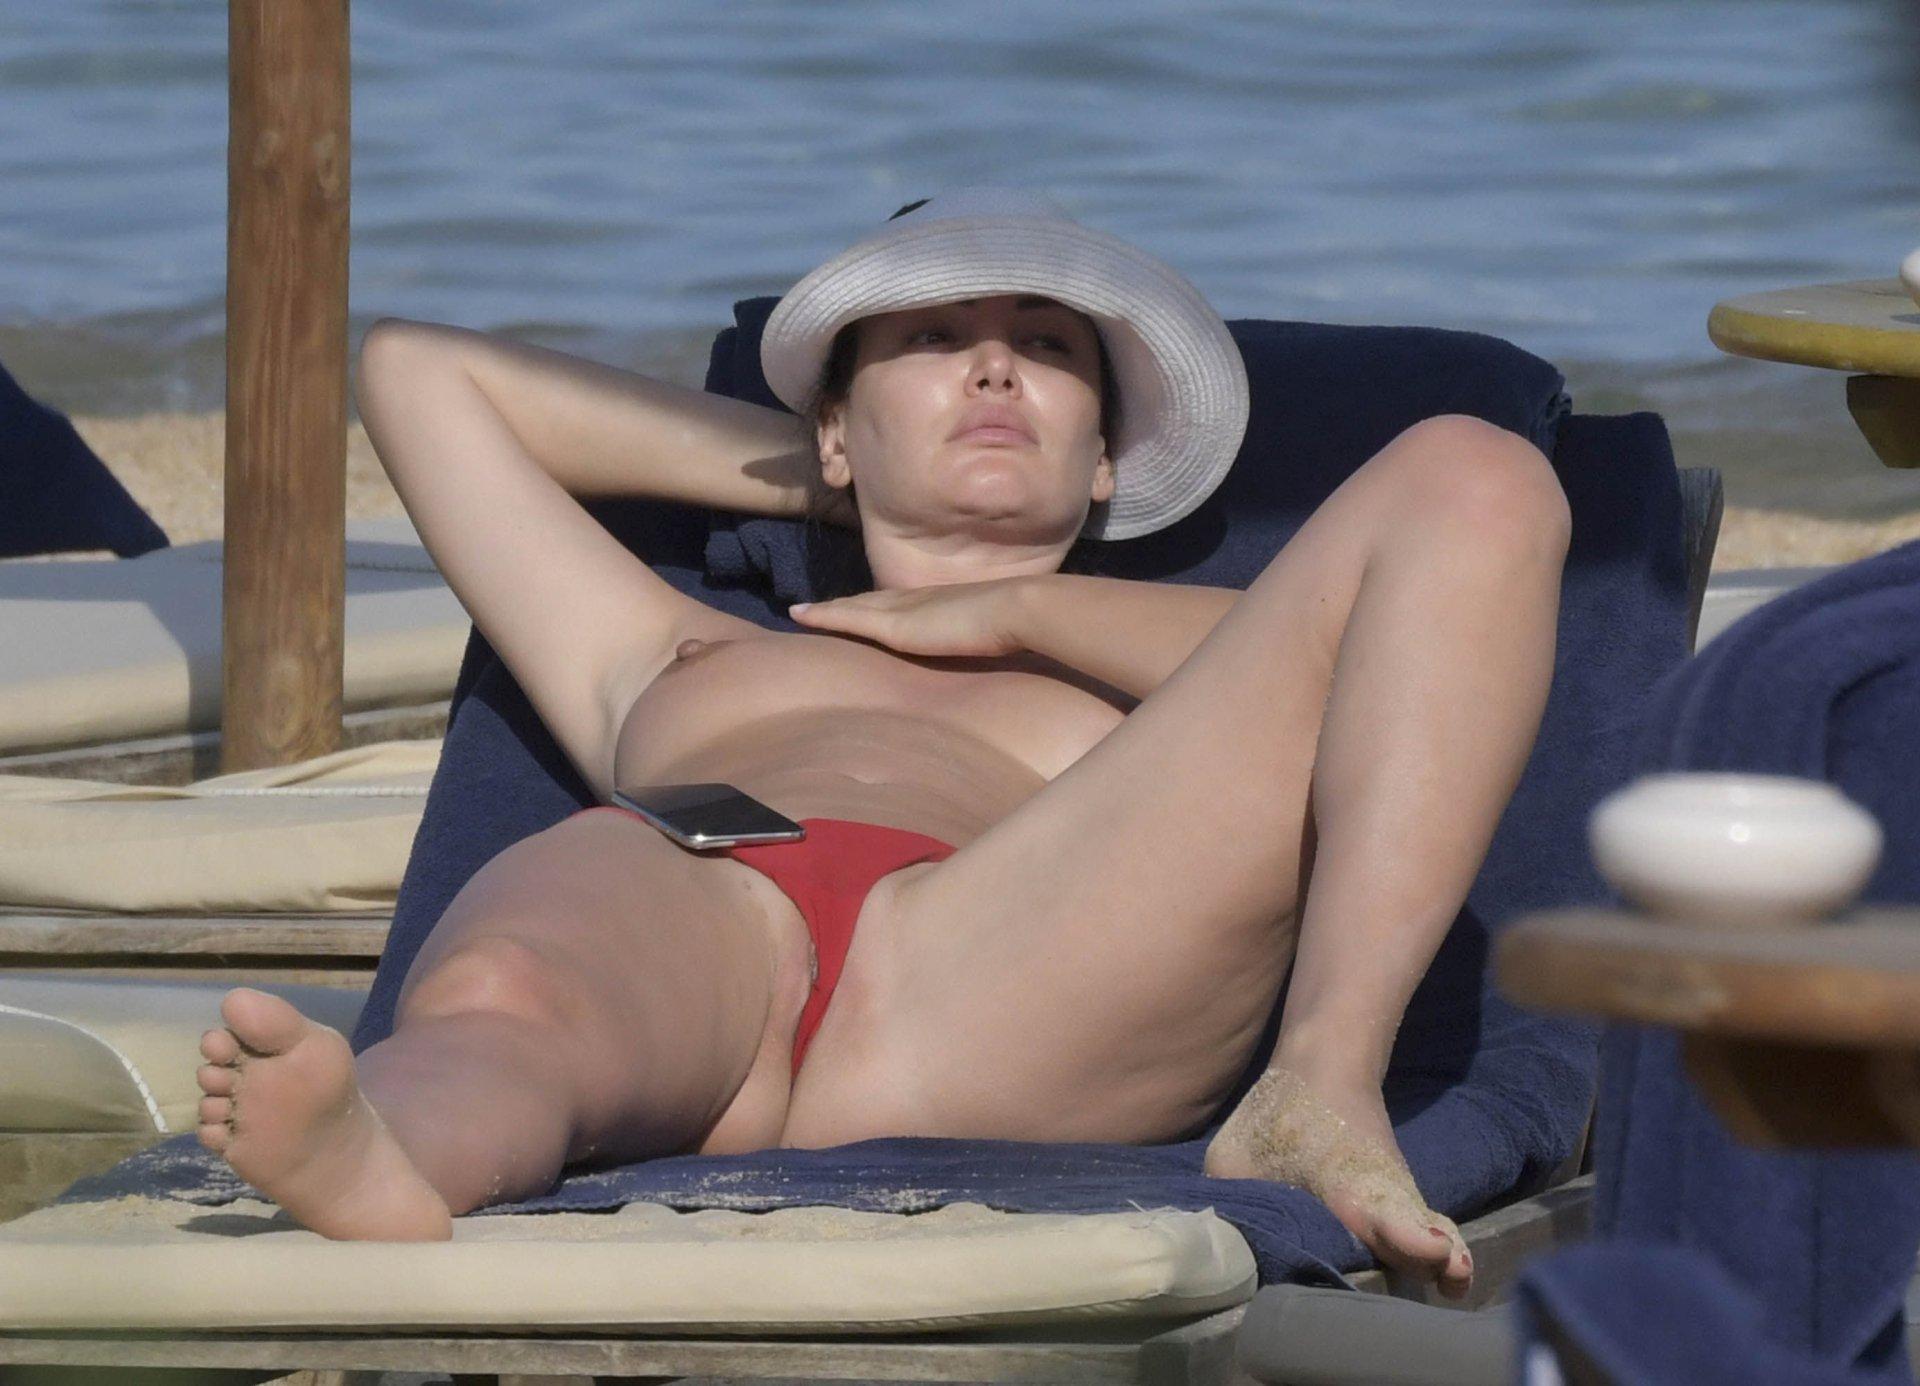 Bleona Qereti Topless on Beach in Italy 14